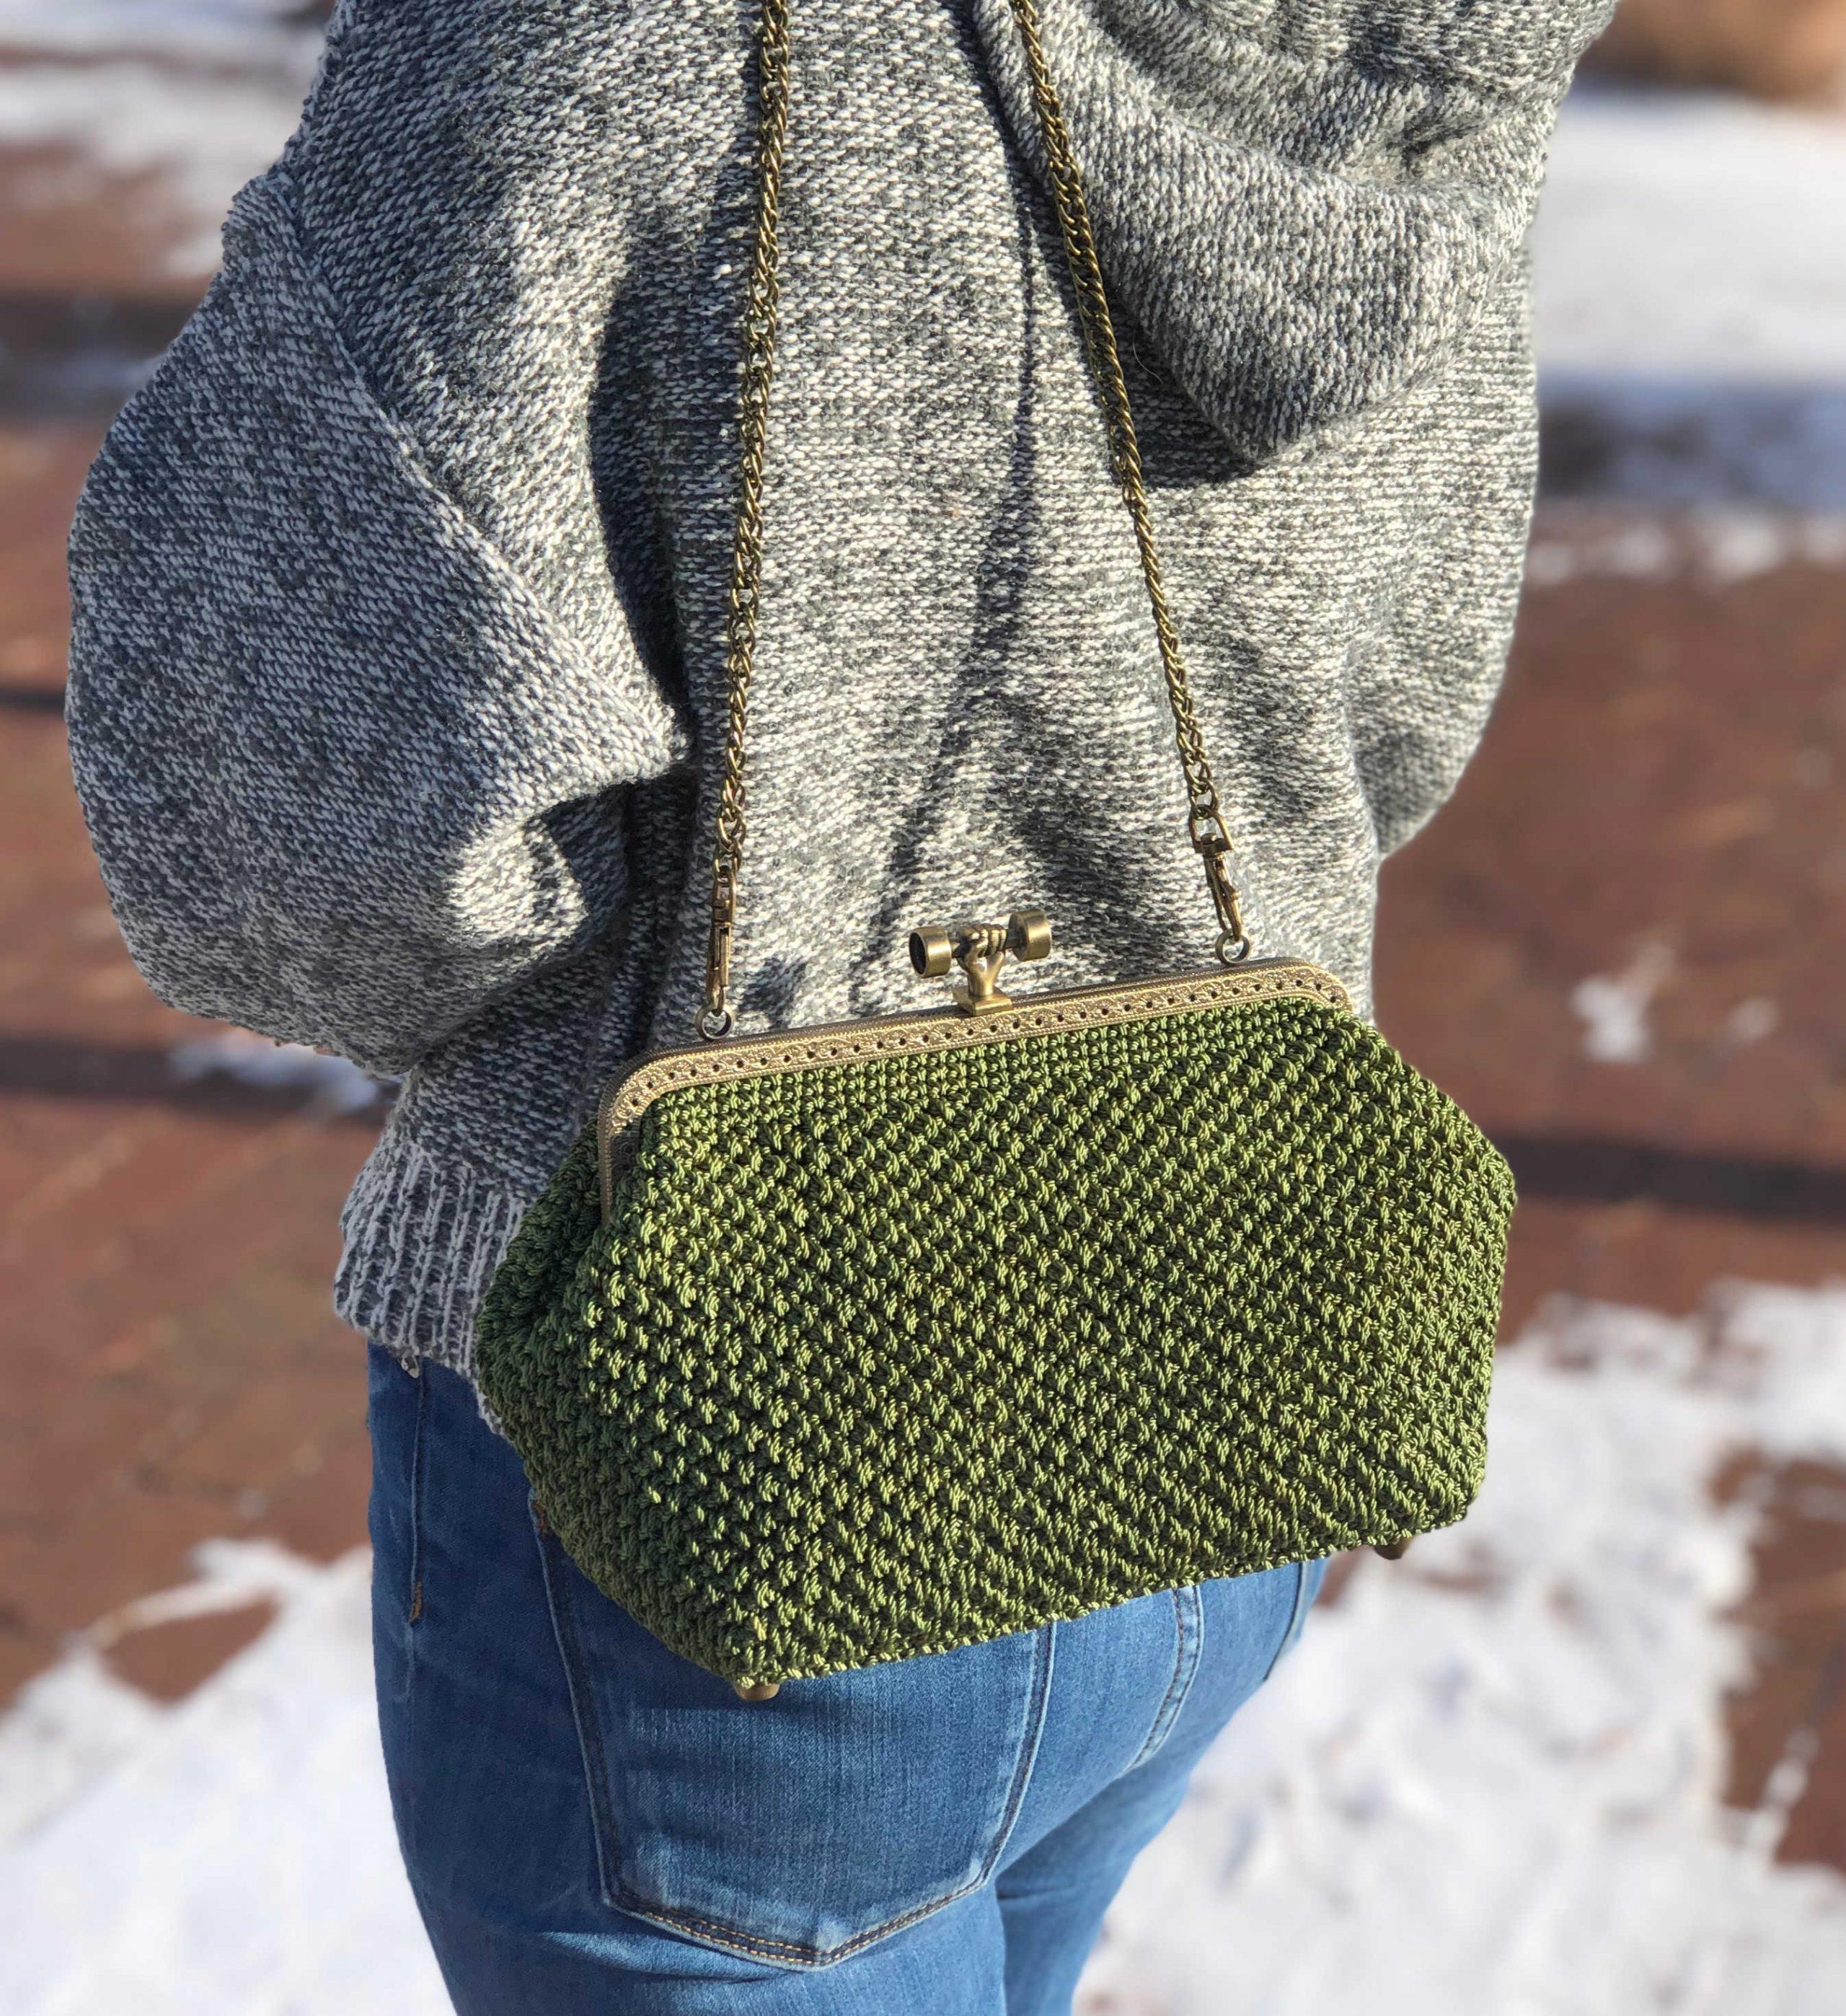 Crochet Purseclutch Bag Free Video Tutorial Knitcroaddict